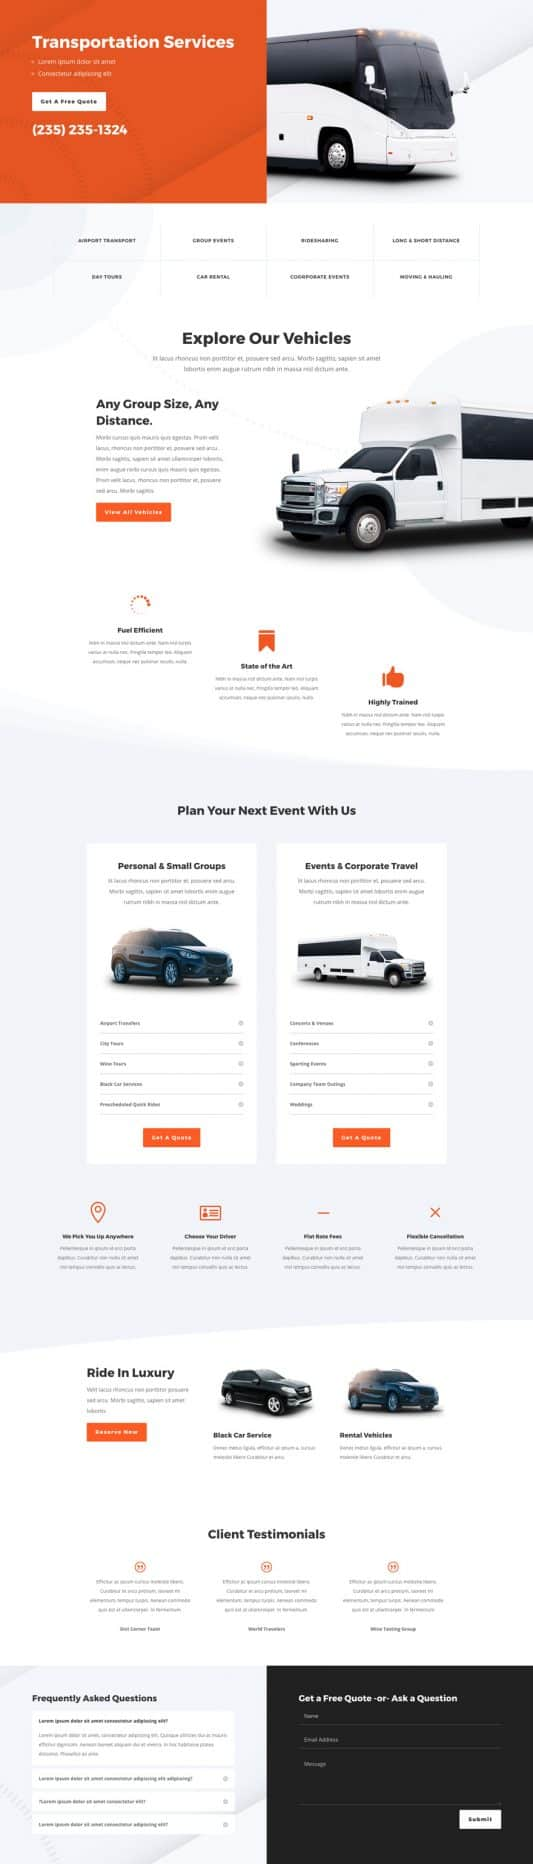 Transportation Services Web Design 4